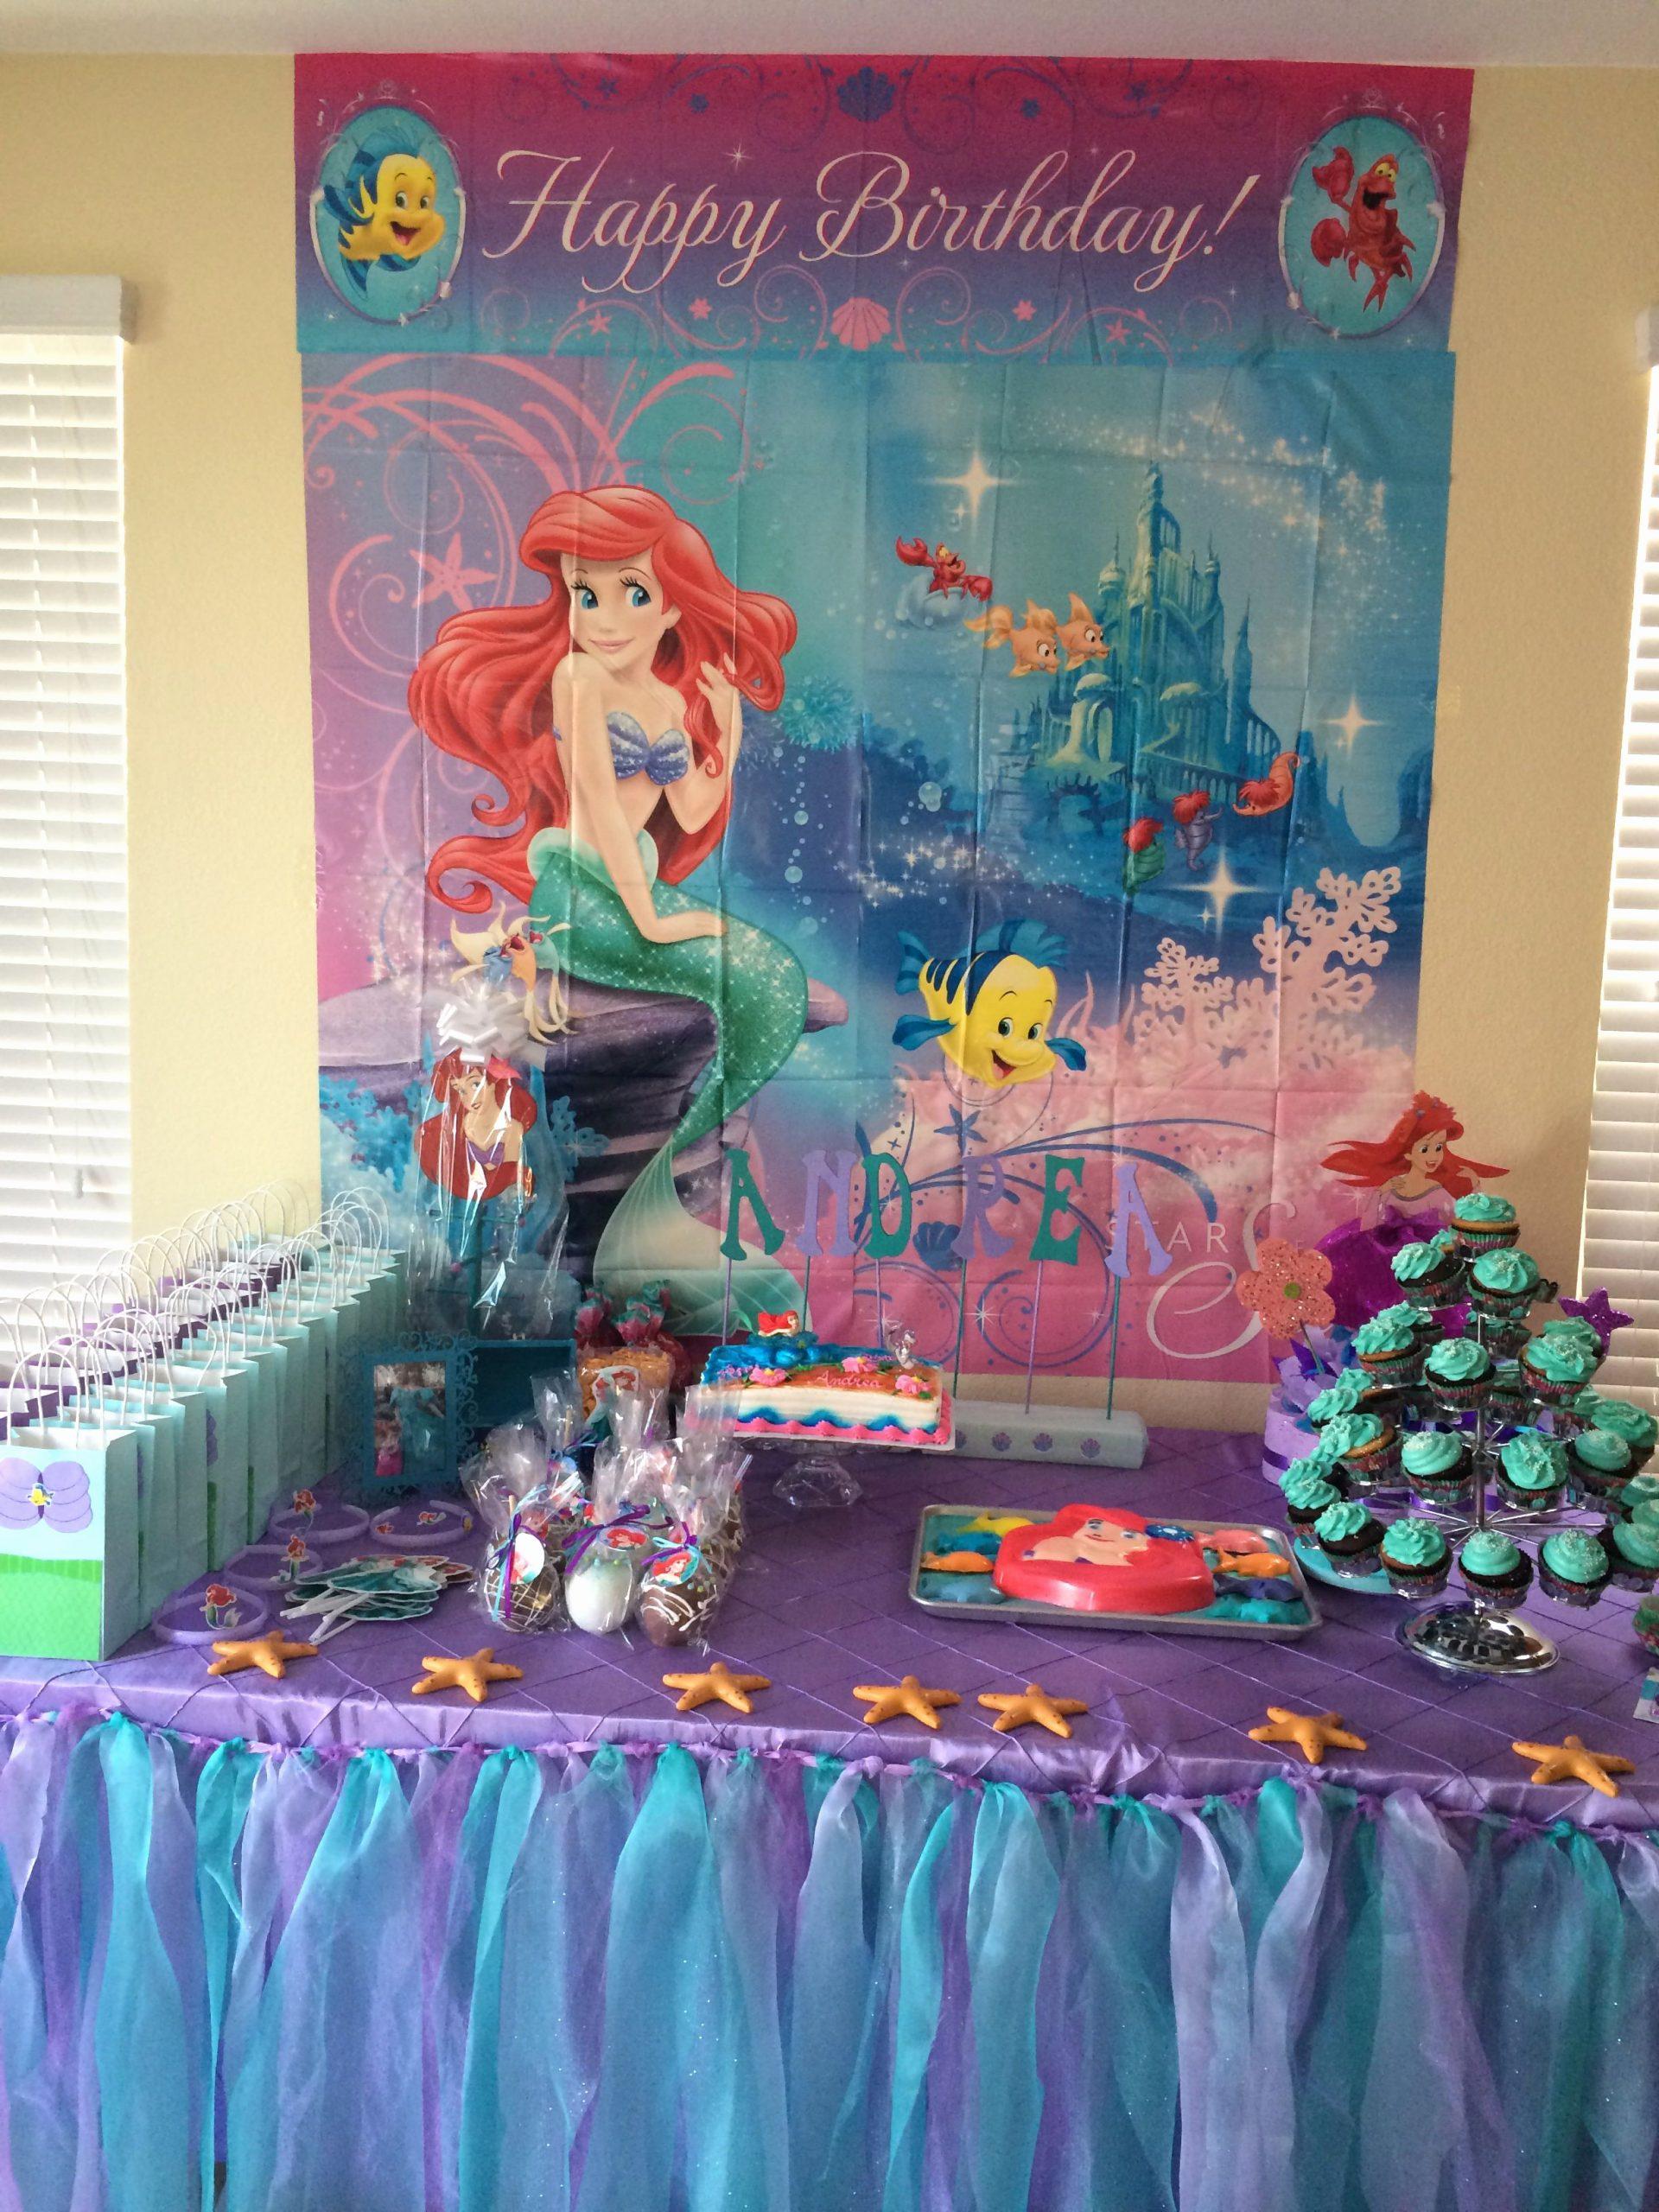 Little Mermaid Birthday Decoration Ideas Elegant 5 Best Little Girl Party Decoration Ideas Images On Home